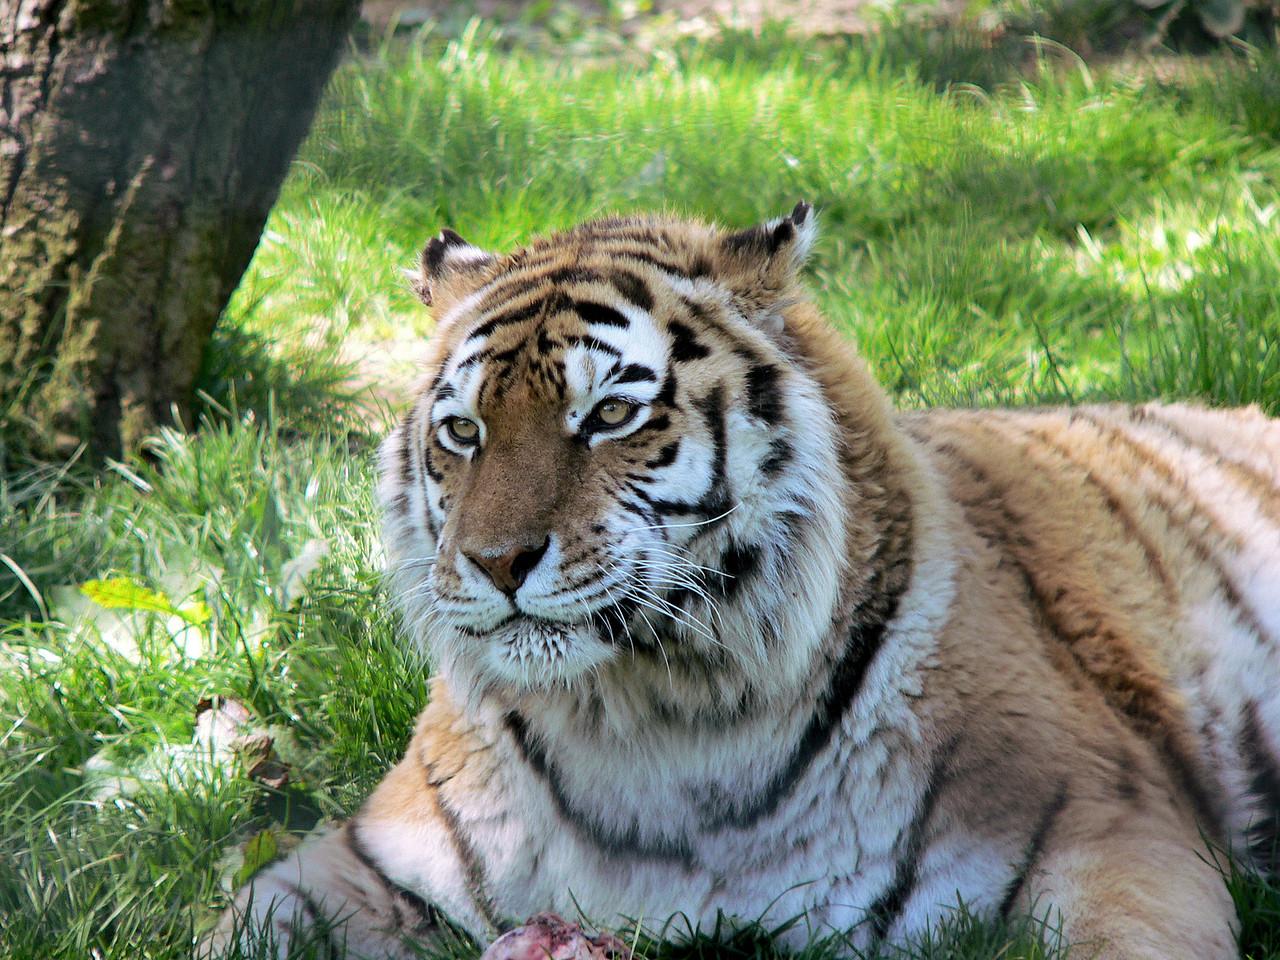 A tiger at Whipsnade